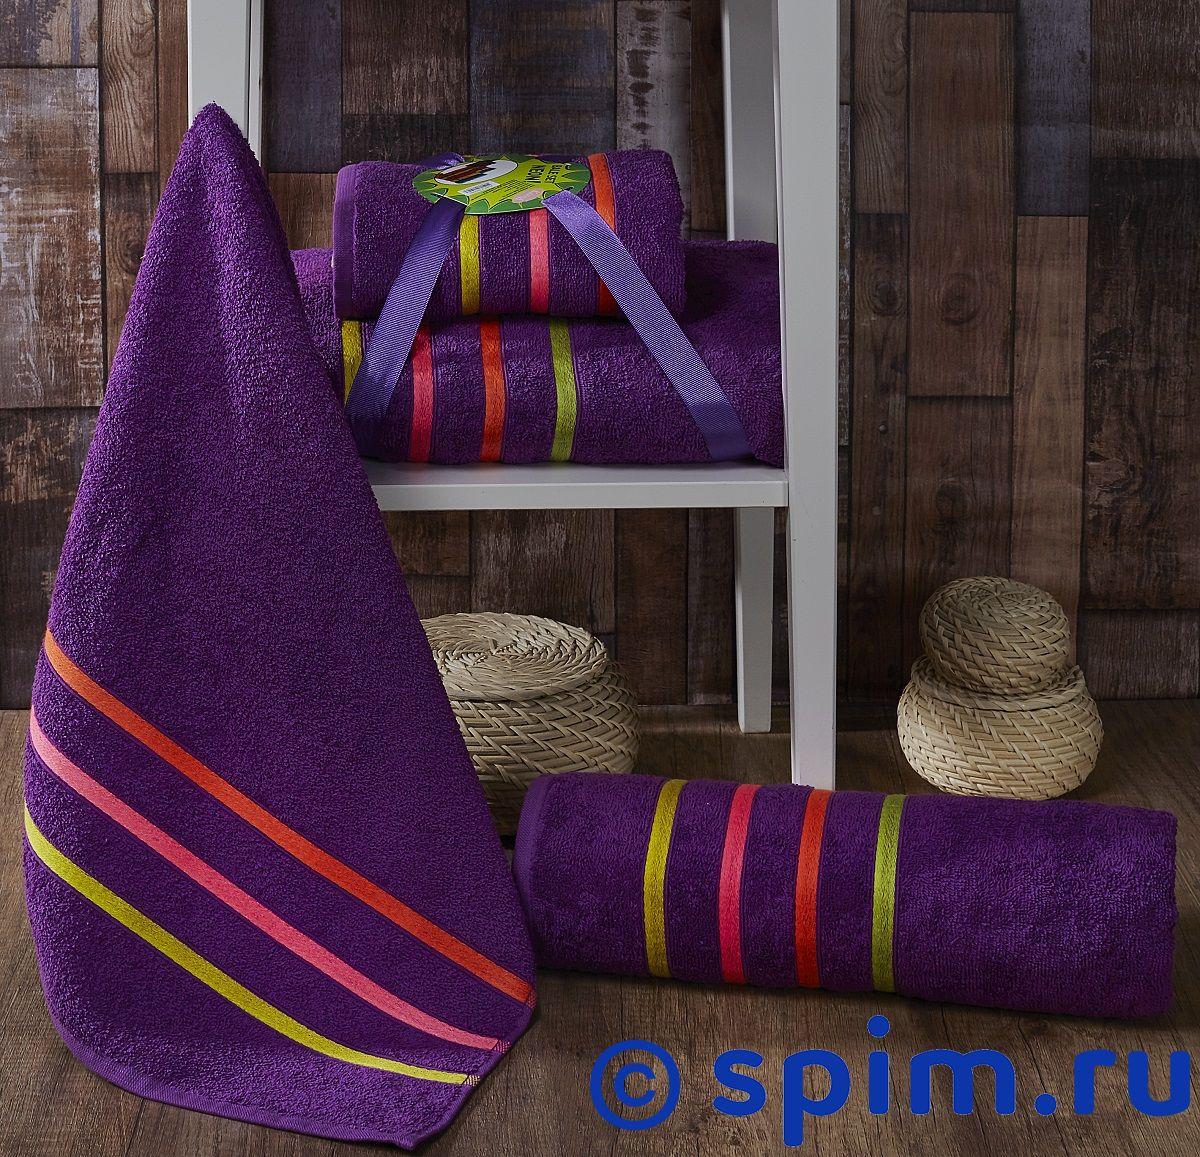 Комплект полотенец Karna Bale Neon, фиолетовый арт. 967/char002 комплект полотенец karna victory бордовый арт 2386 char002